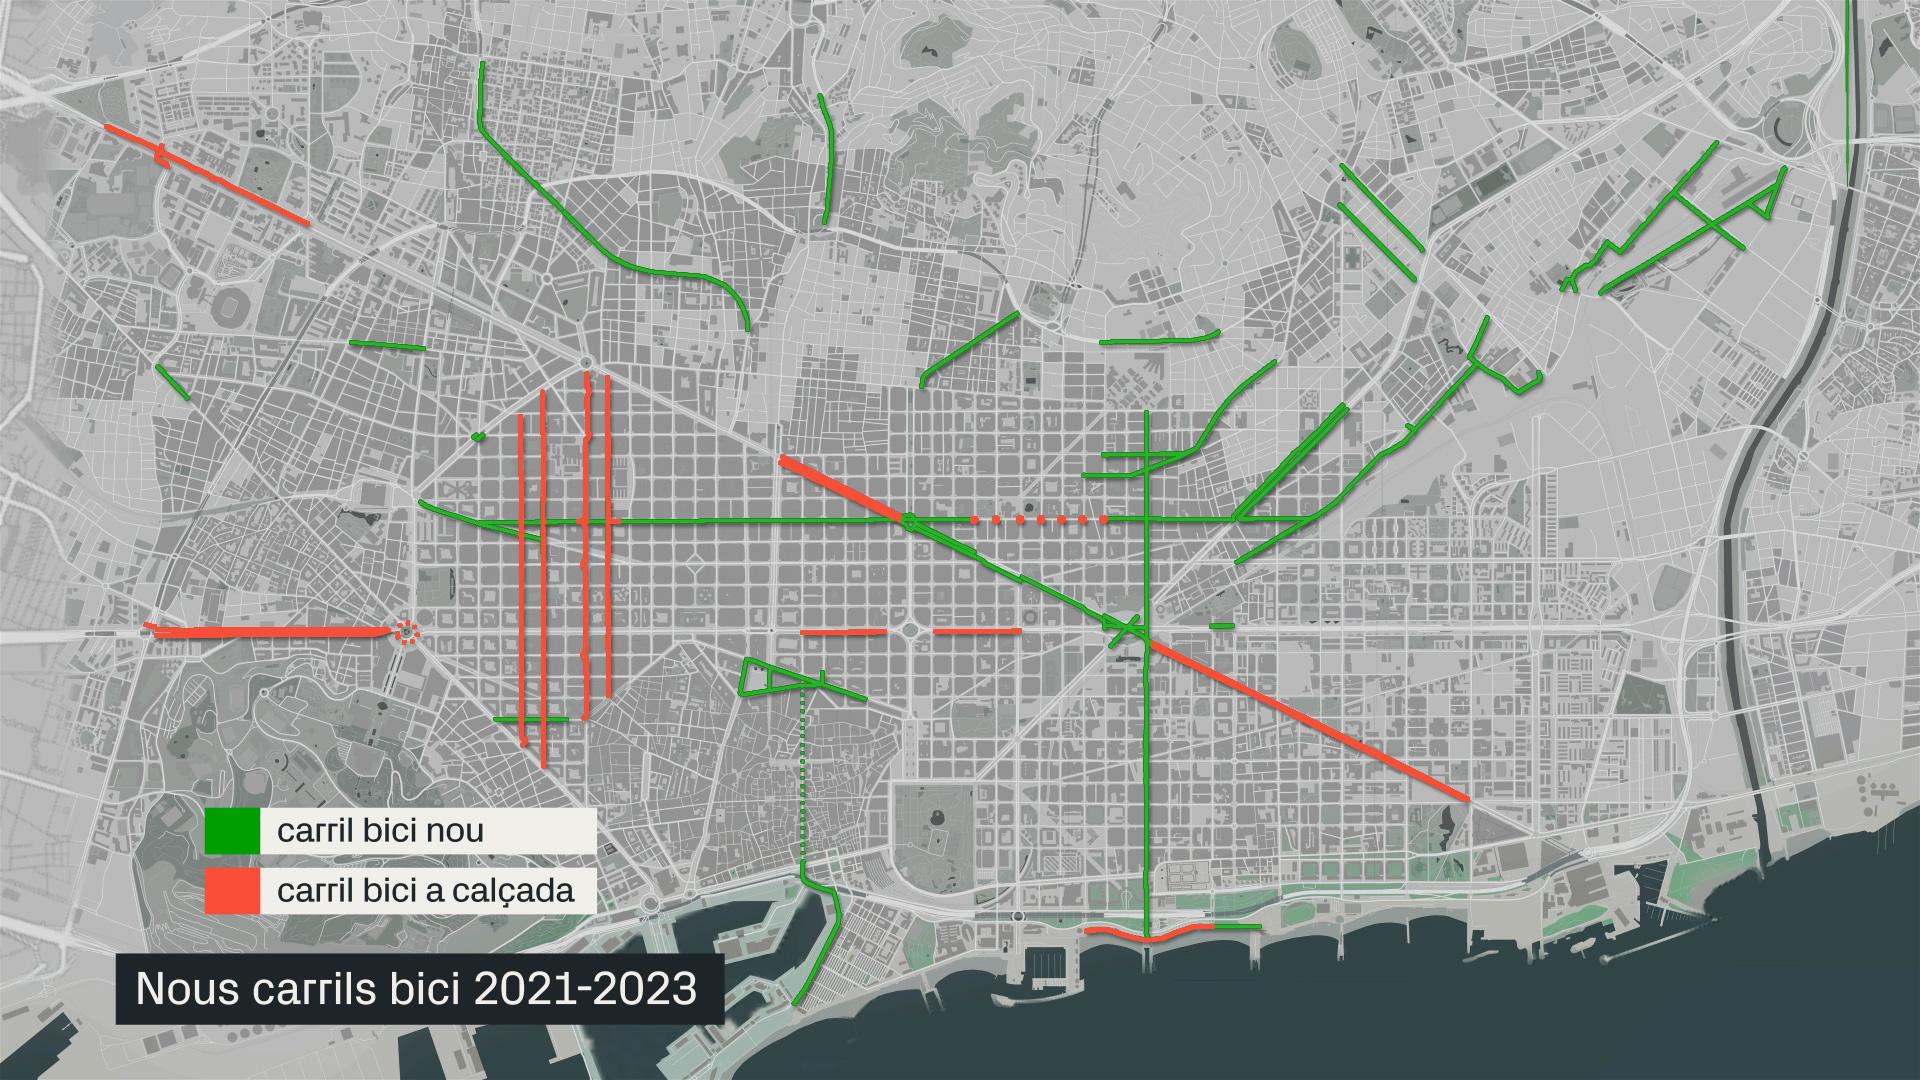 mapa nous carrils bici 2023